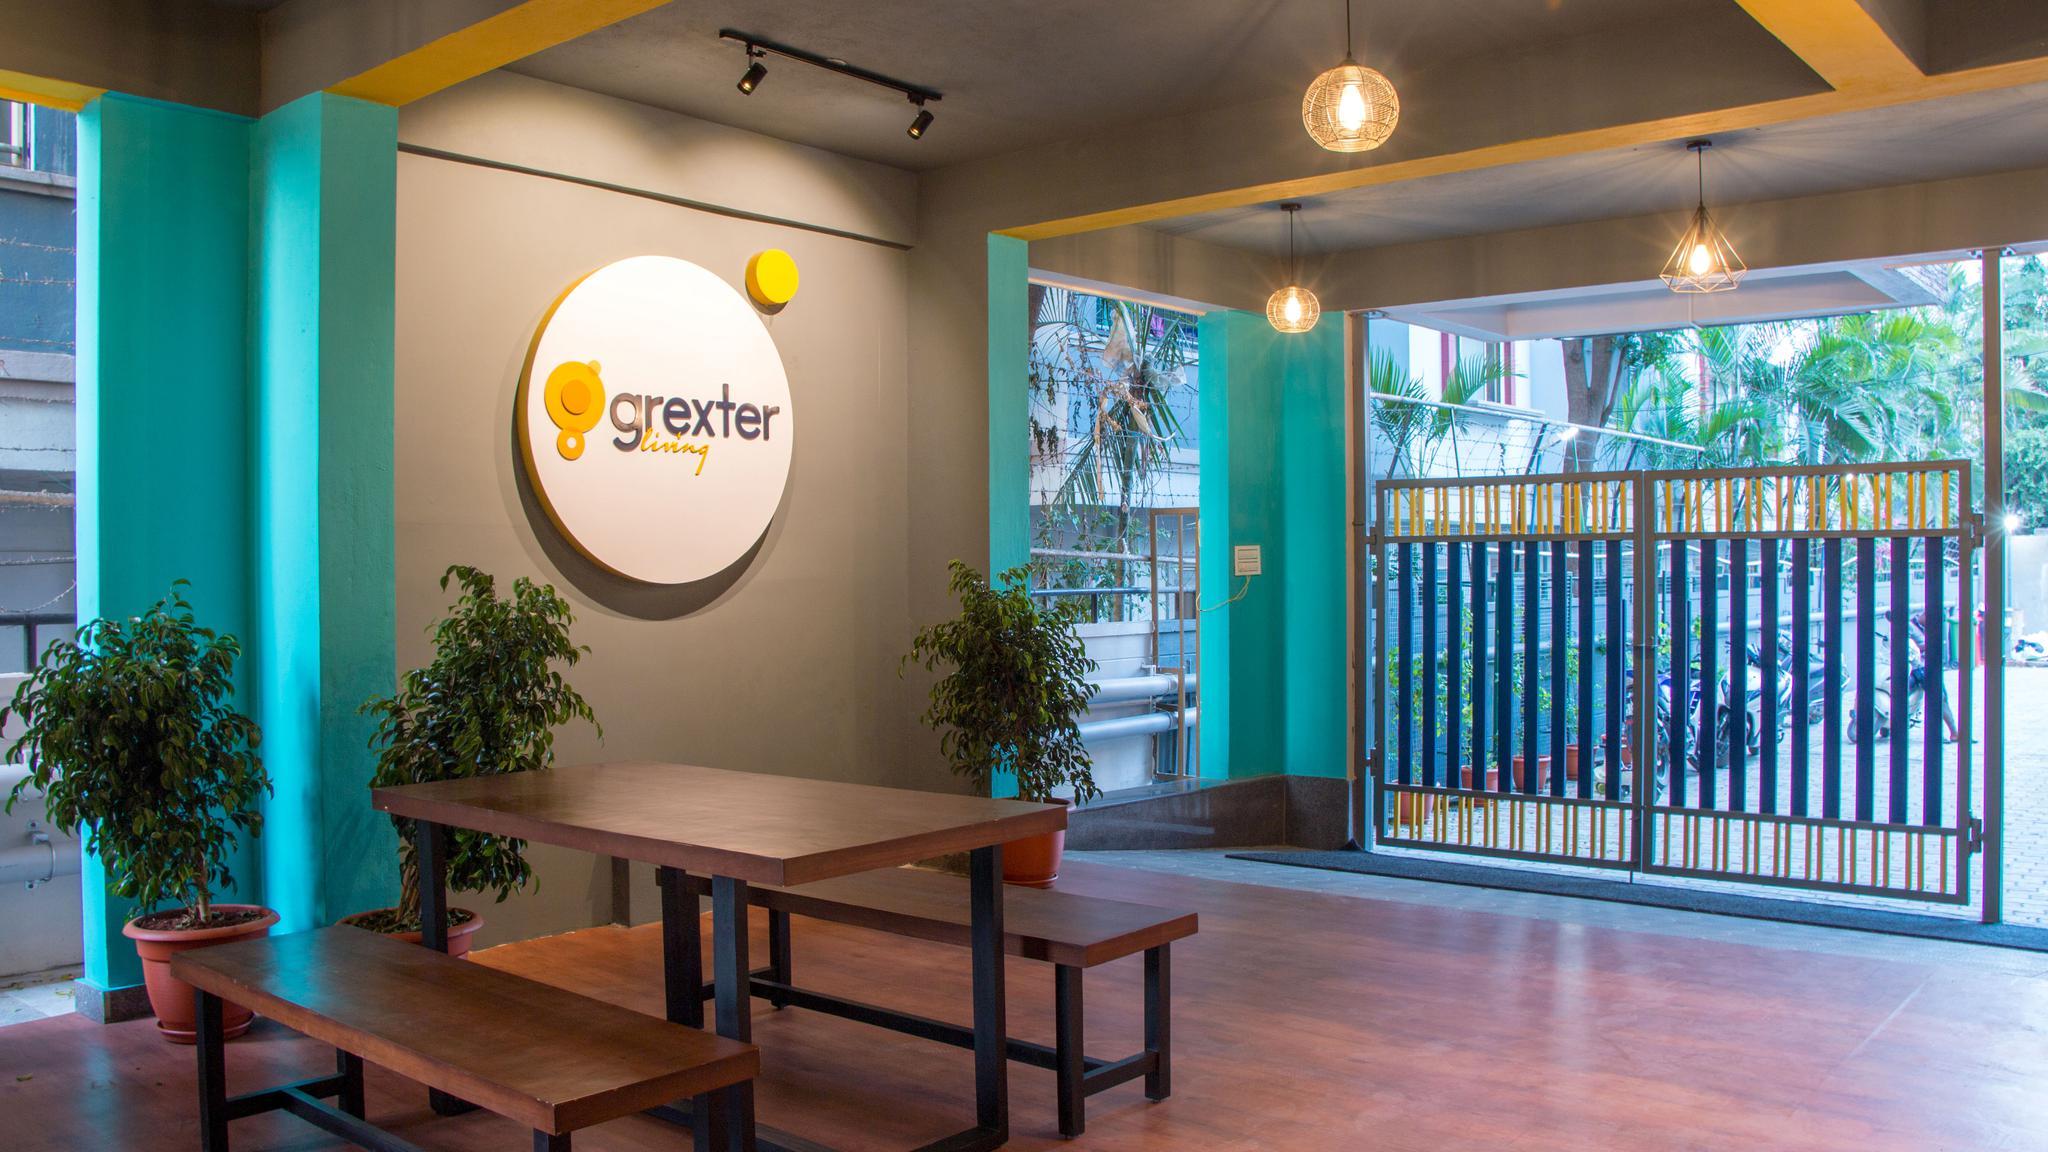 Grexter Epsilon-Coliving-Whitefield-Bengaluru